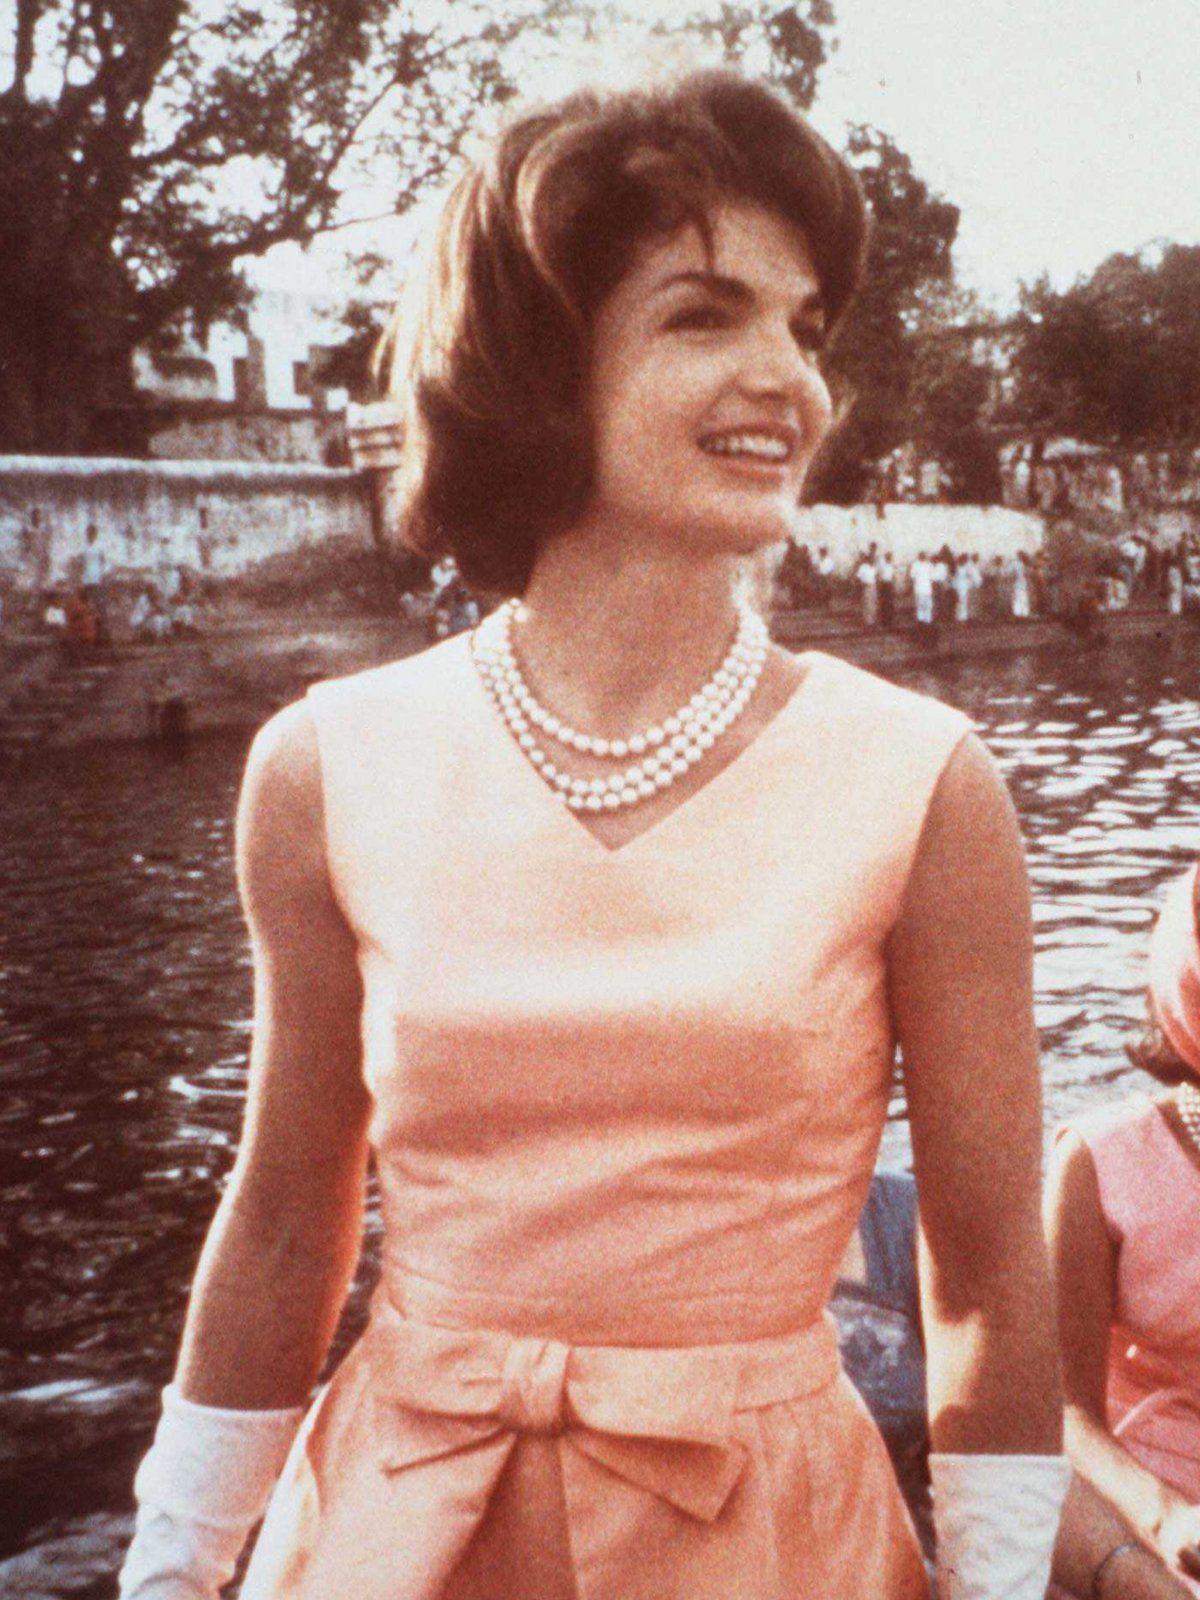 Jackie Kennedy Perlenkette Jackie Kennedy Jacqueline Kennedy Onassis Klassische Eleganz